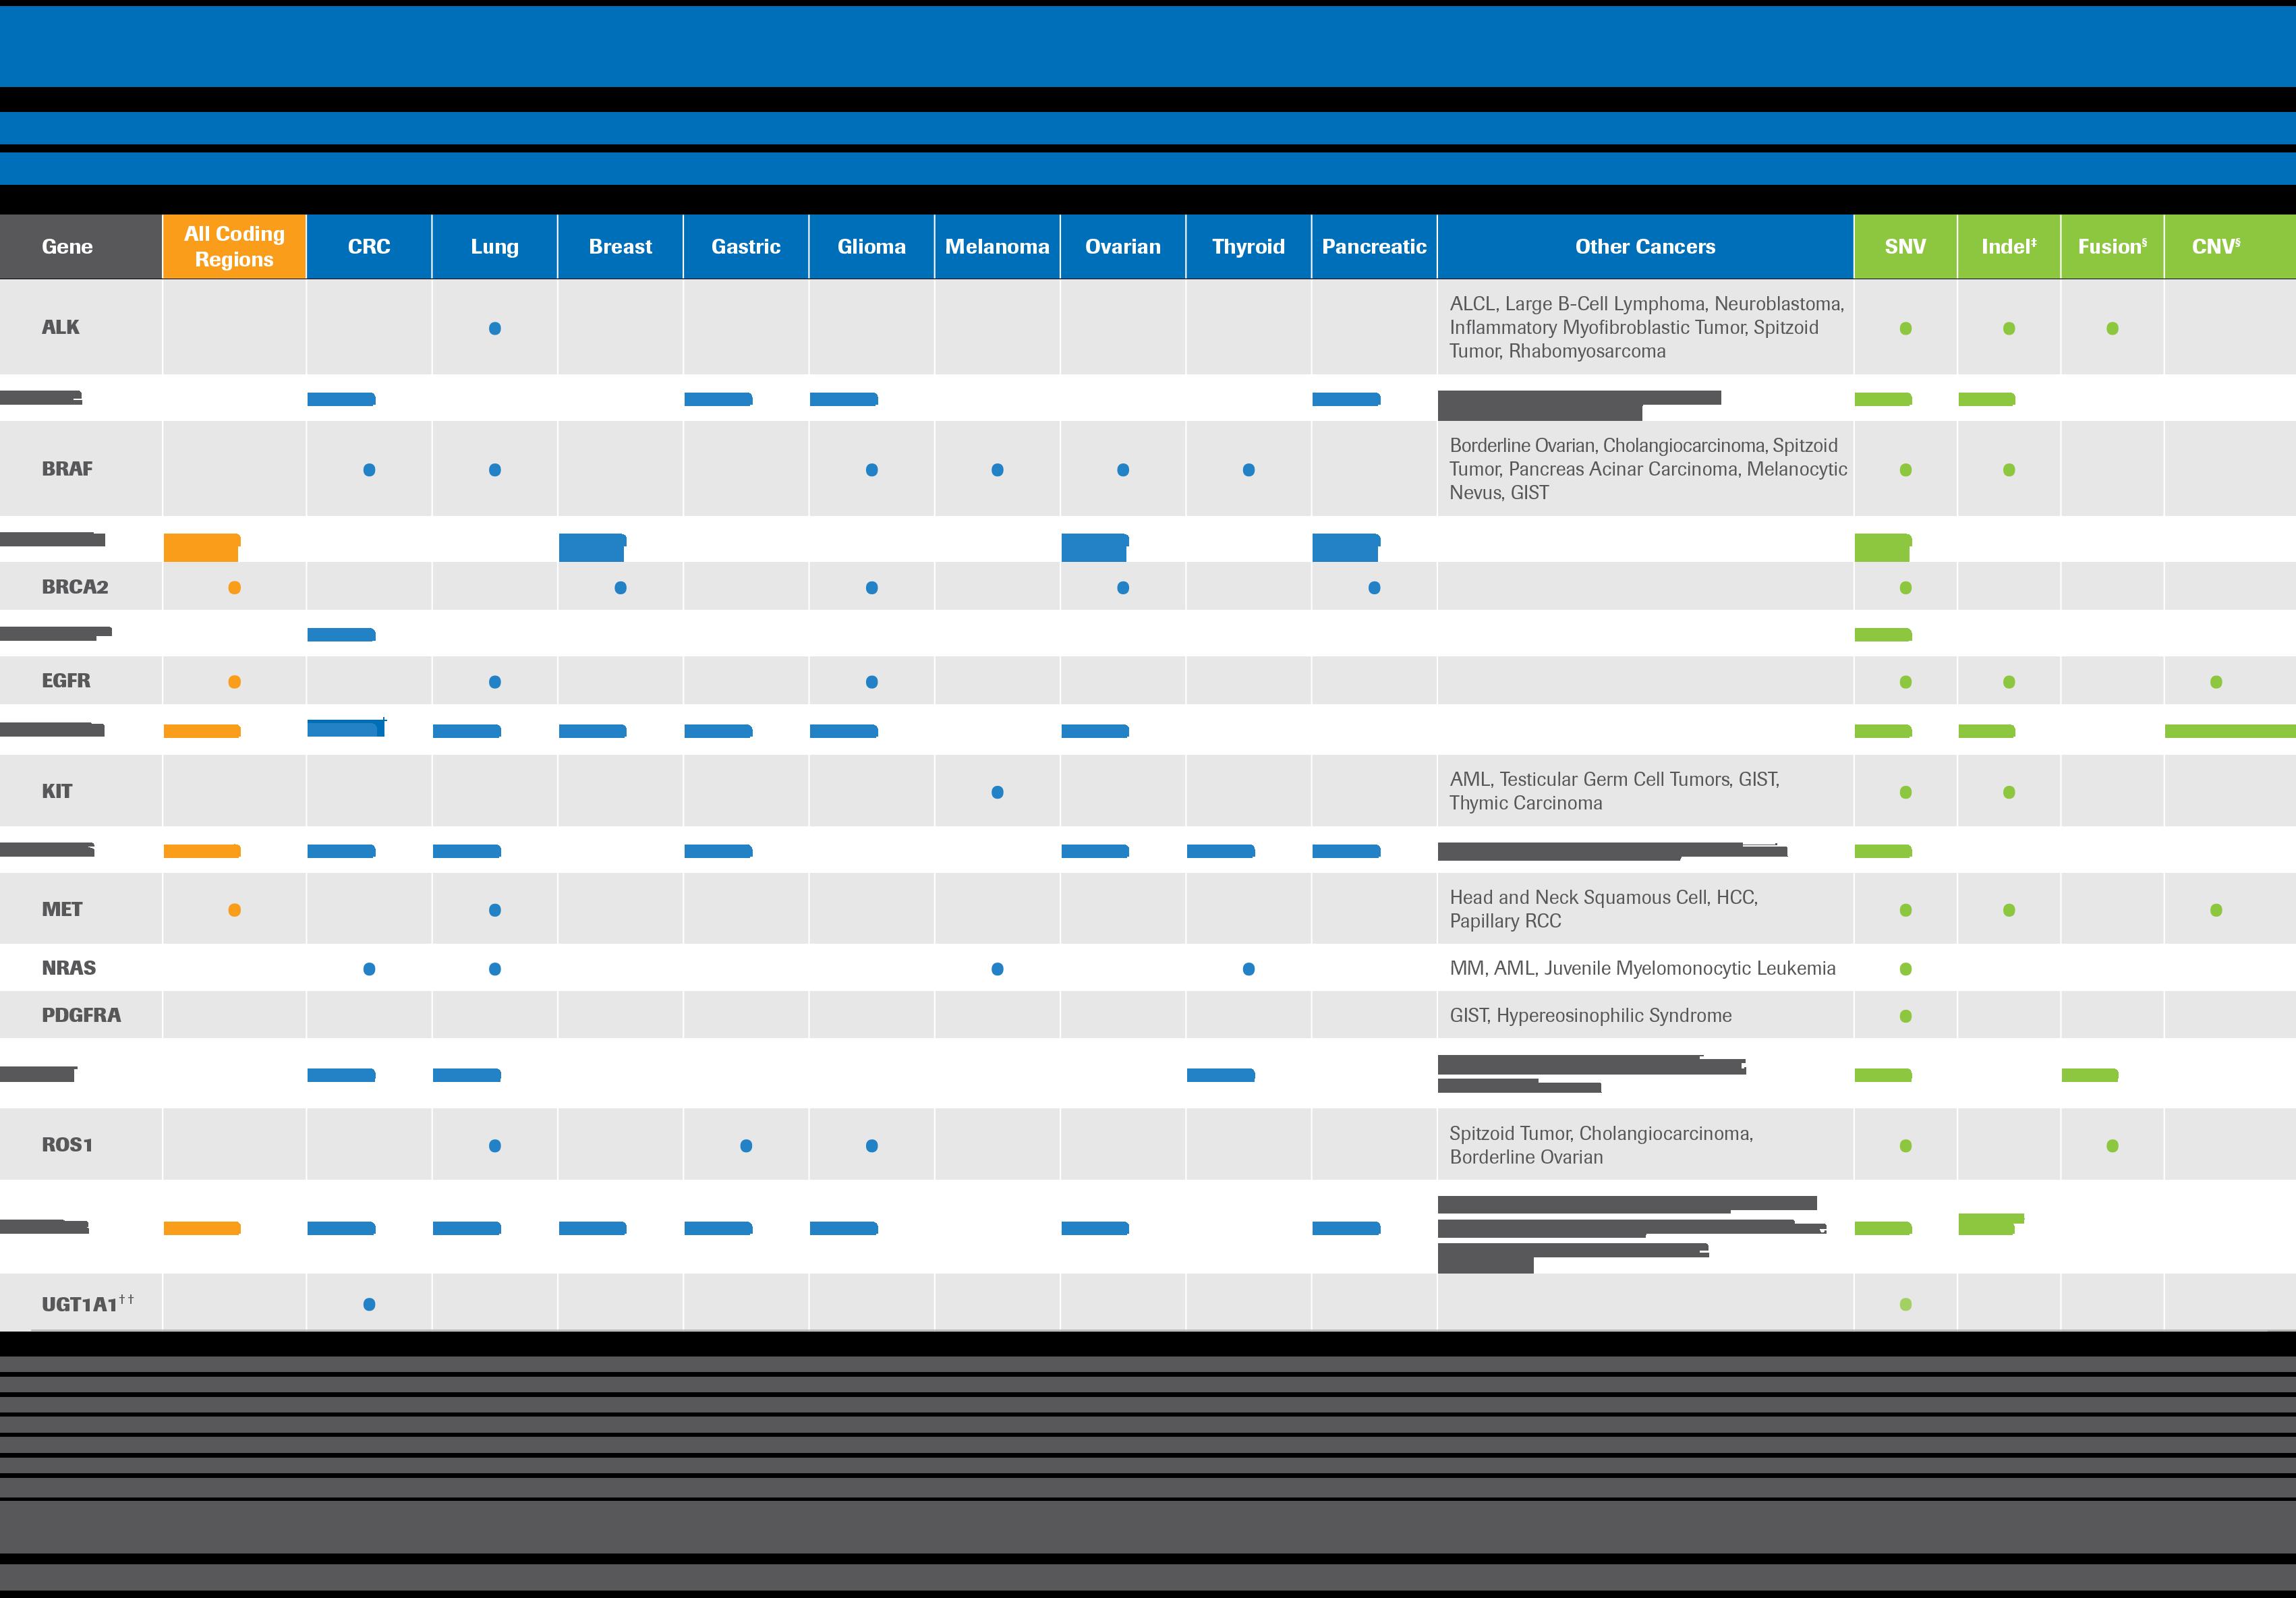 AVENIO_ctDNA_Tumor_Tissue_Targeted_Panel